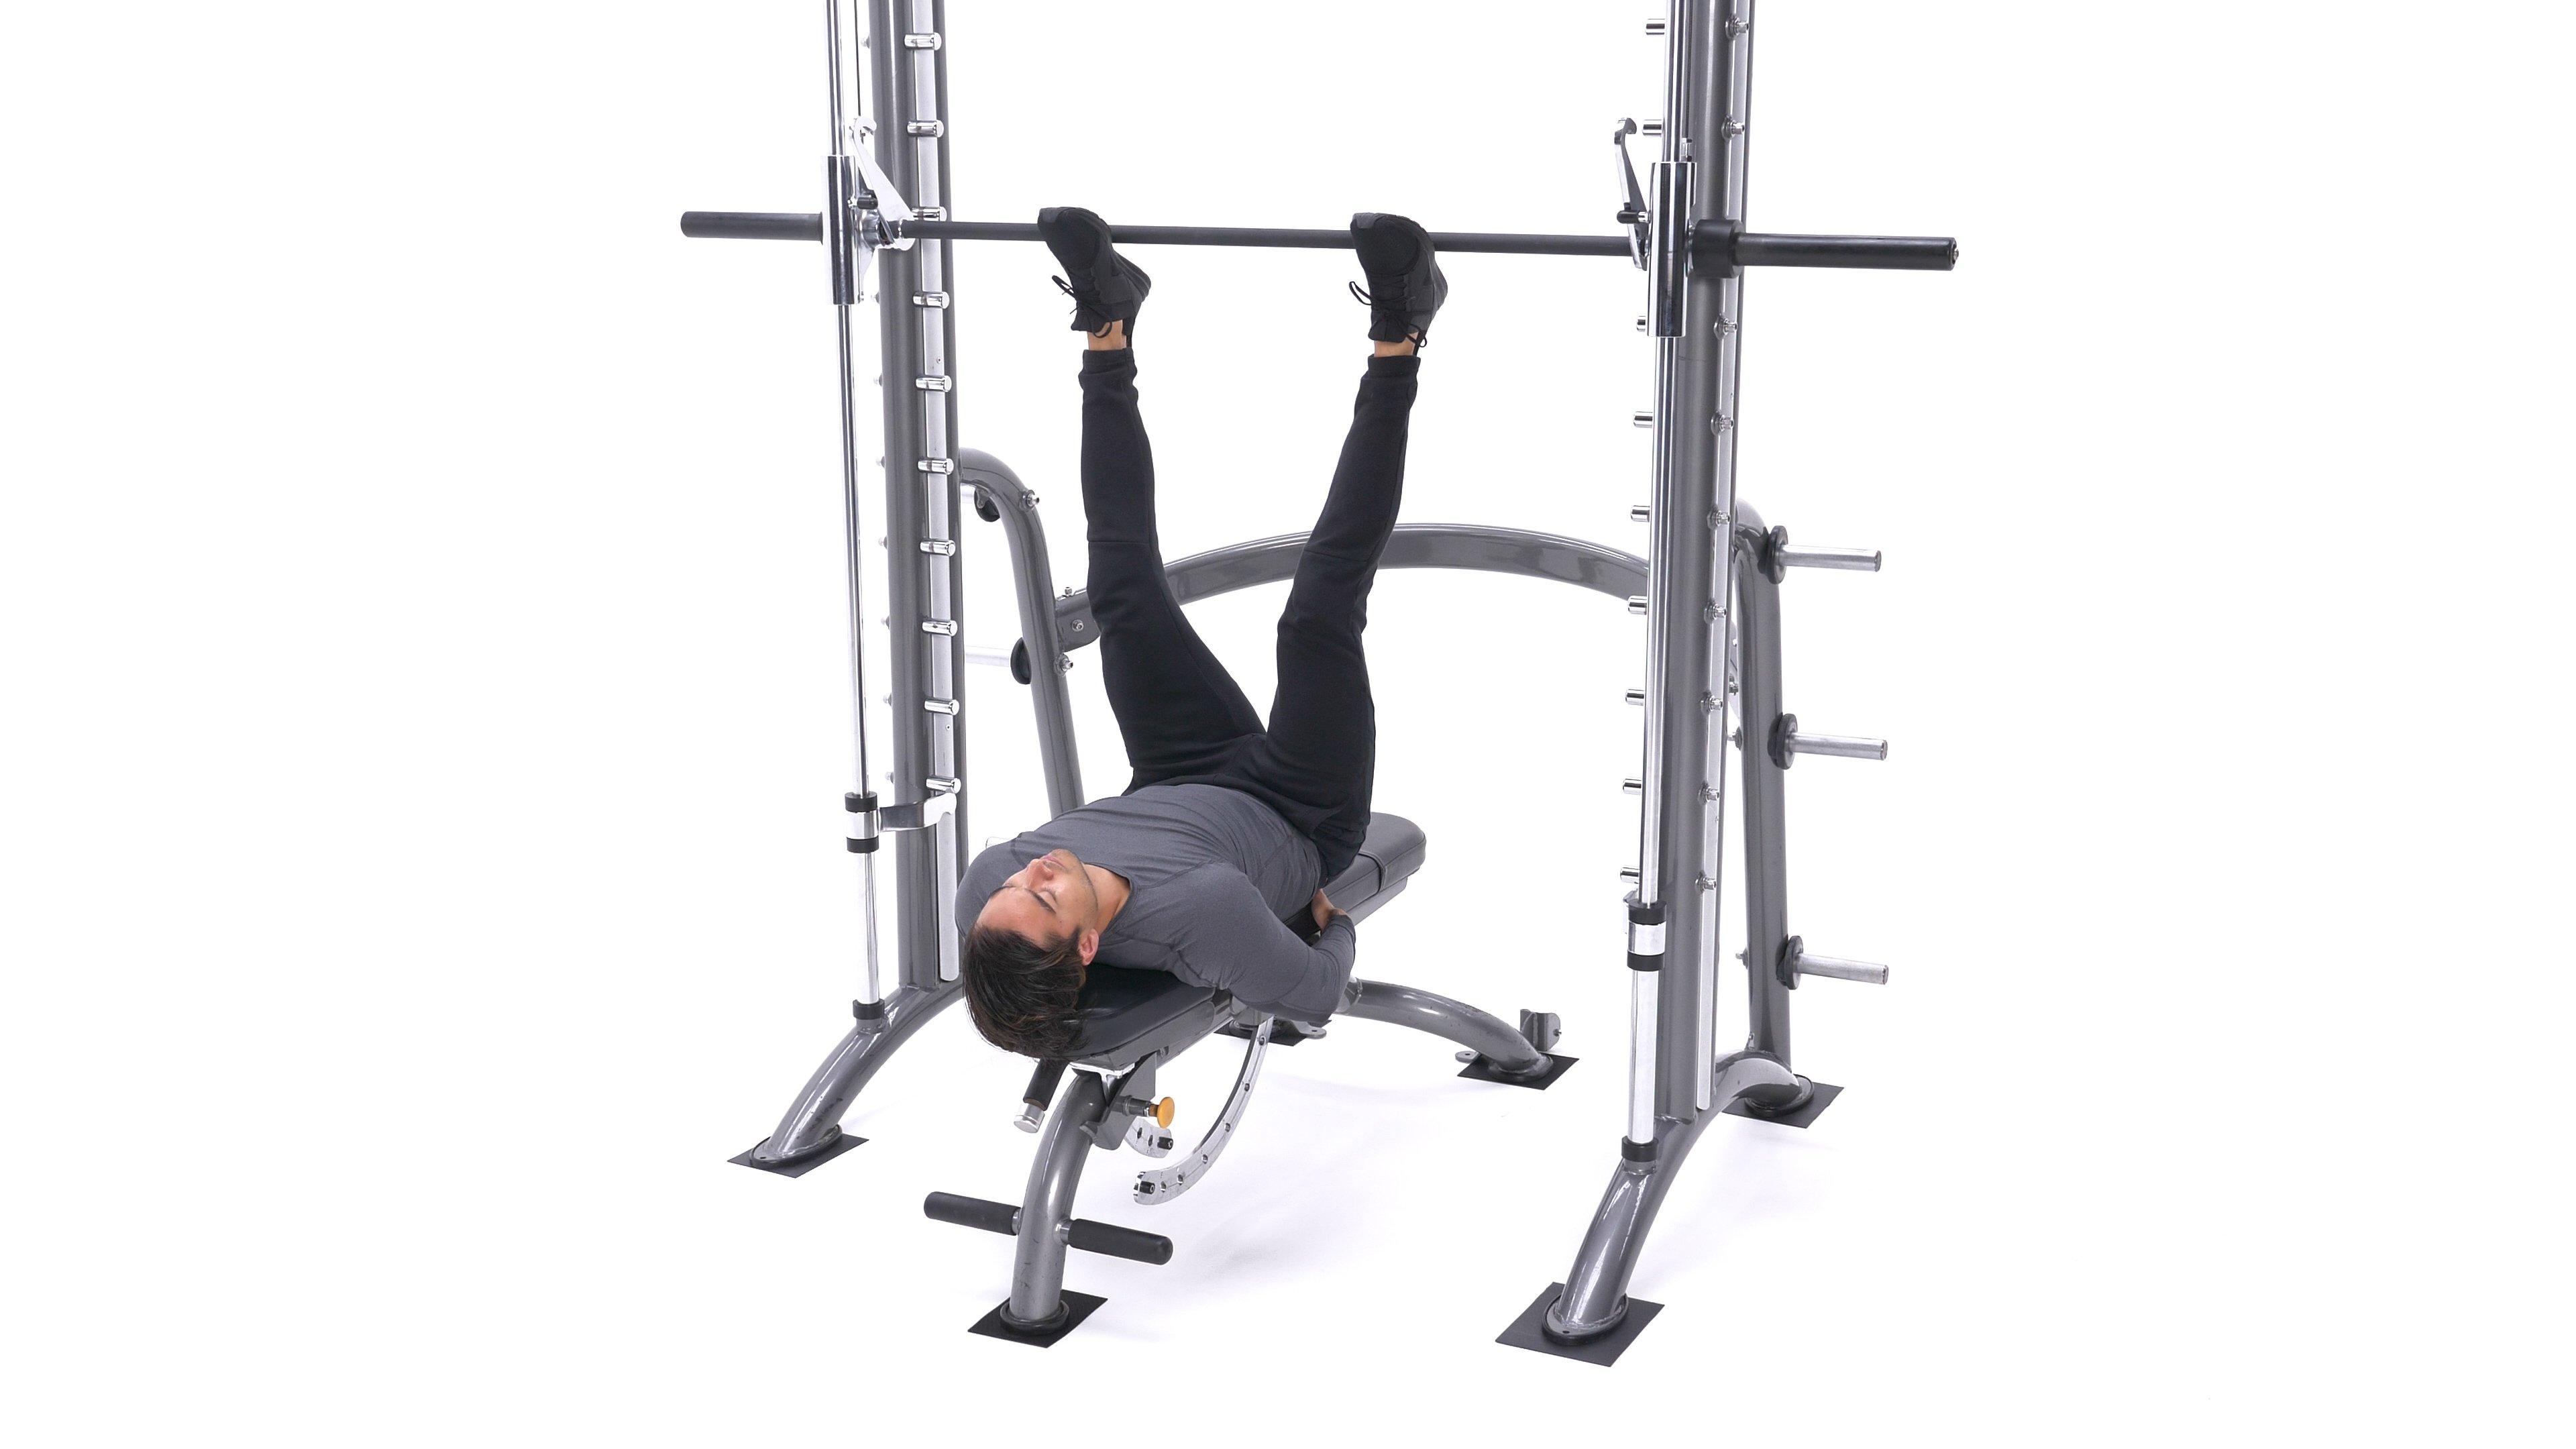 Smith machine leg press image